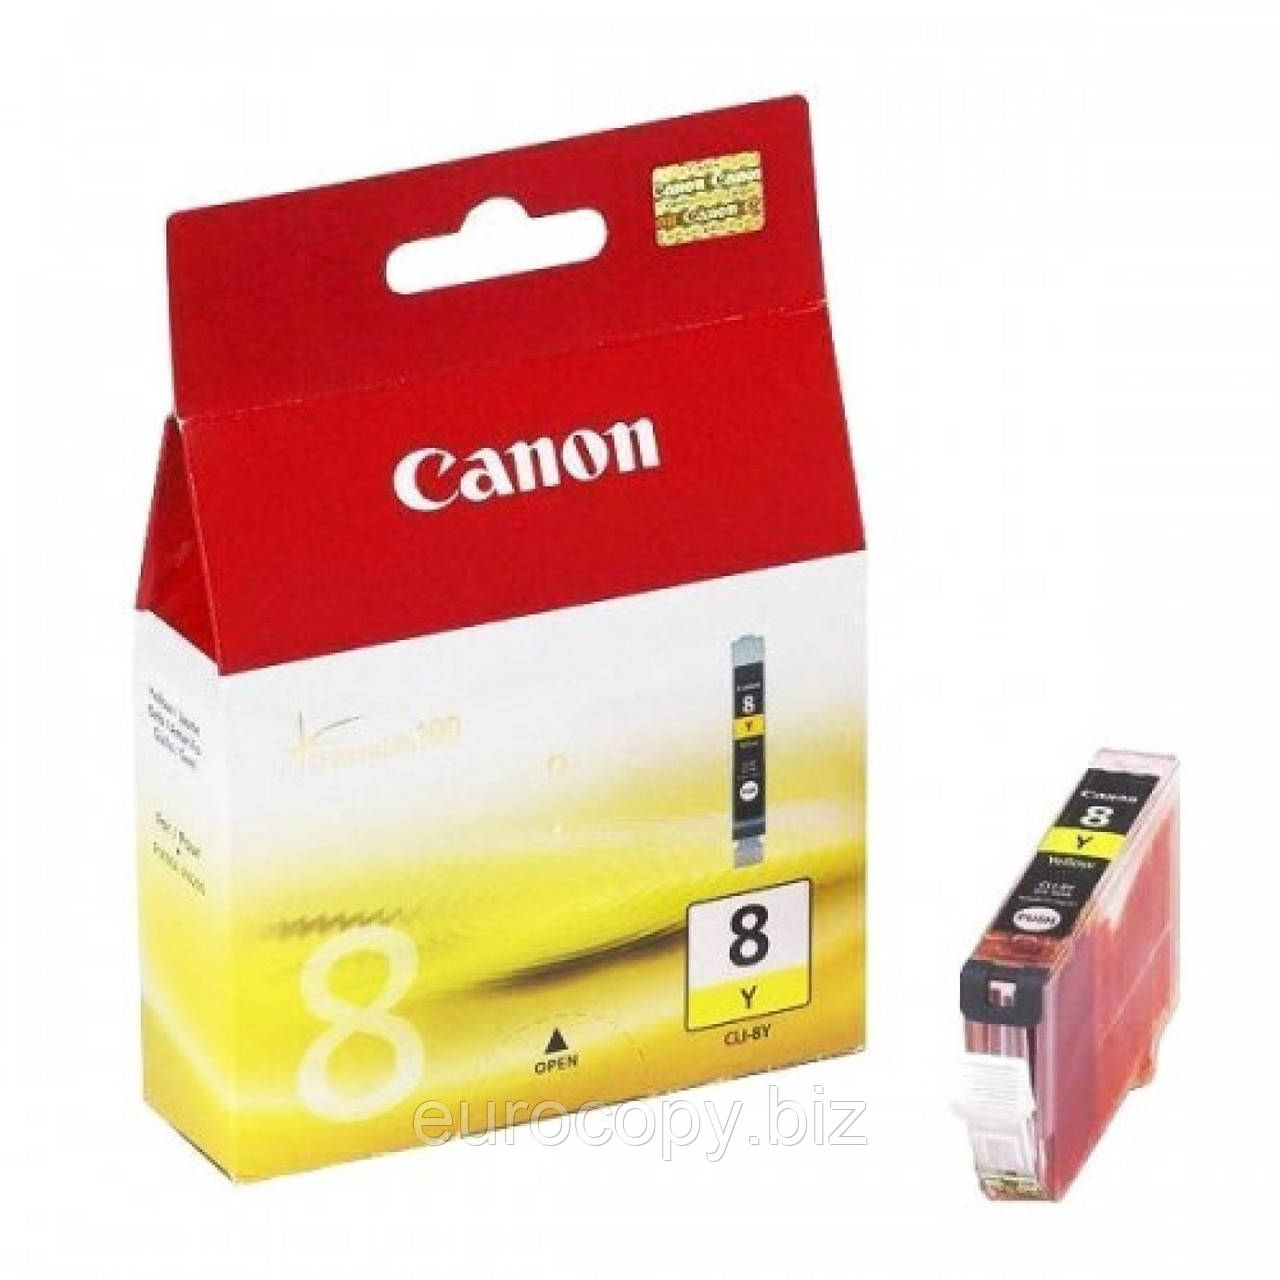 Картридж Canon CLI-8Y Yellow iP4300 (0623B024) Original